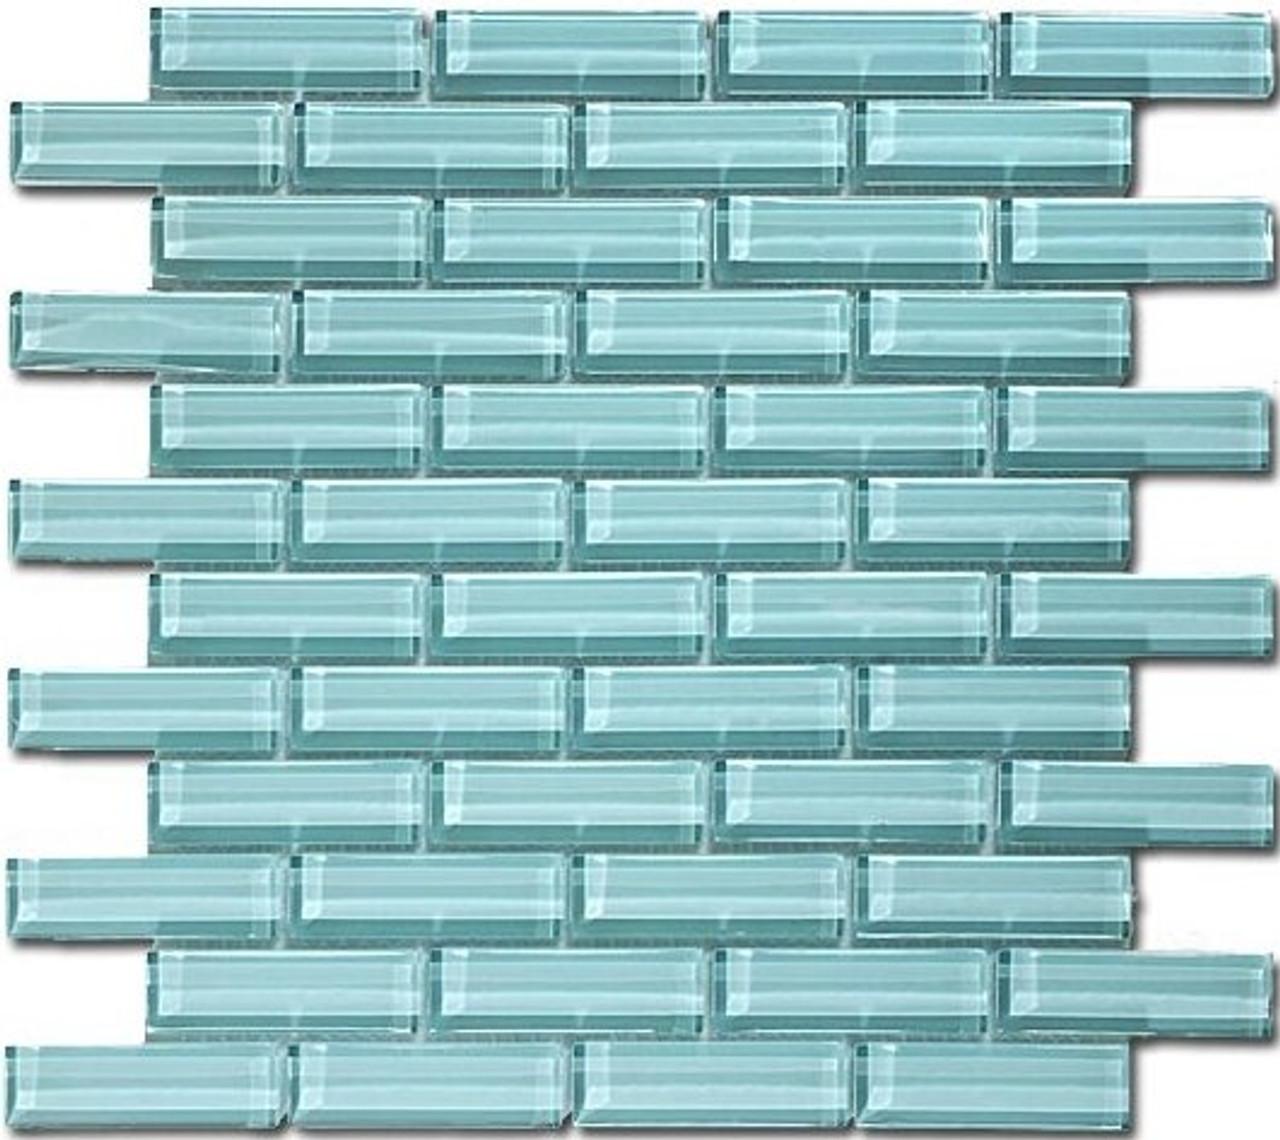 Bella Glass Tiles Crystile Series 1 x 3 Morning Mist C11-2